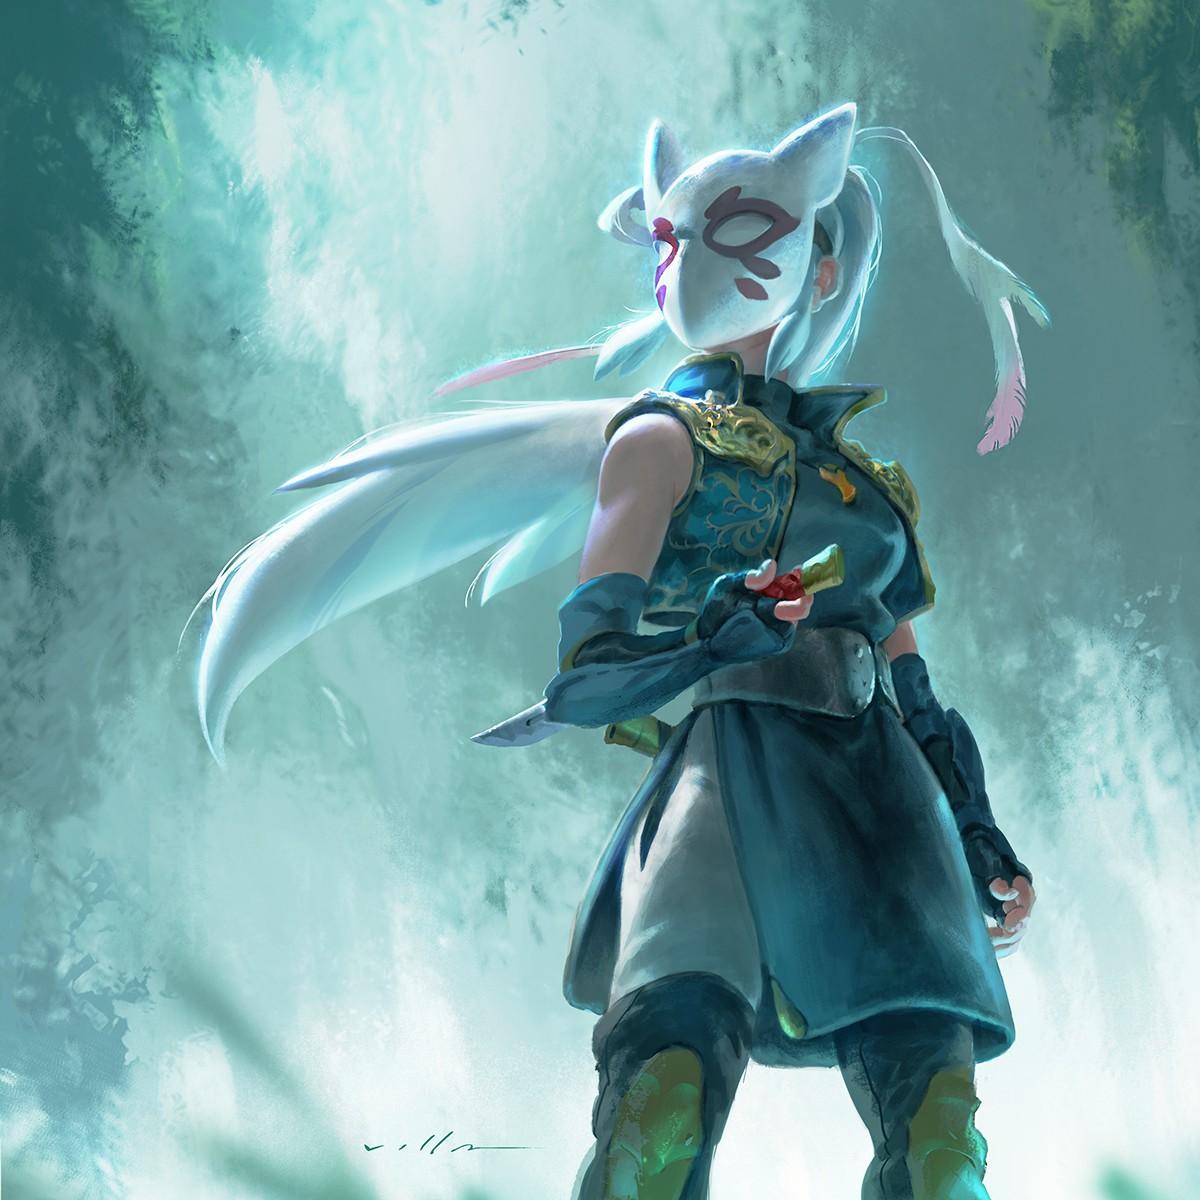 Wallpaper Illustration Fantasy Art Anime Mask Ninja